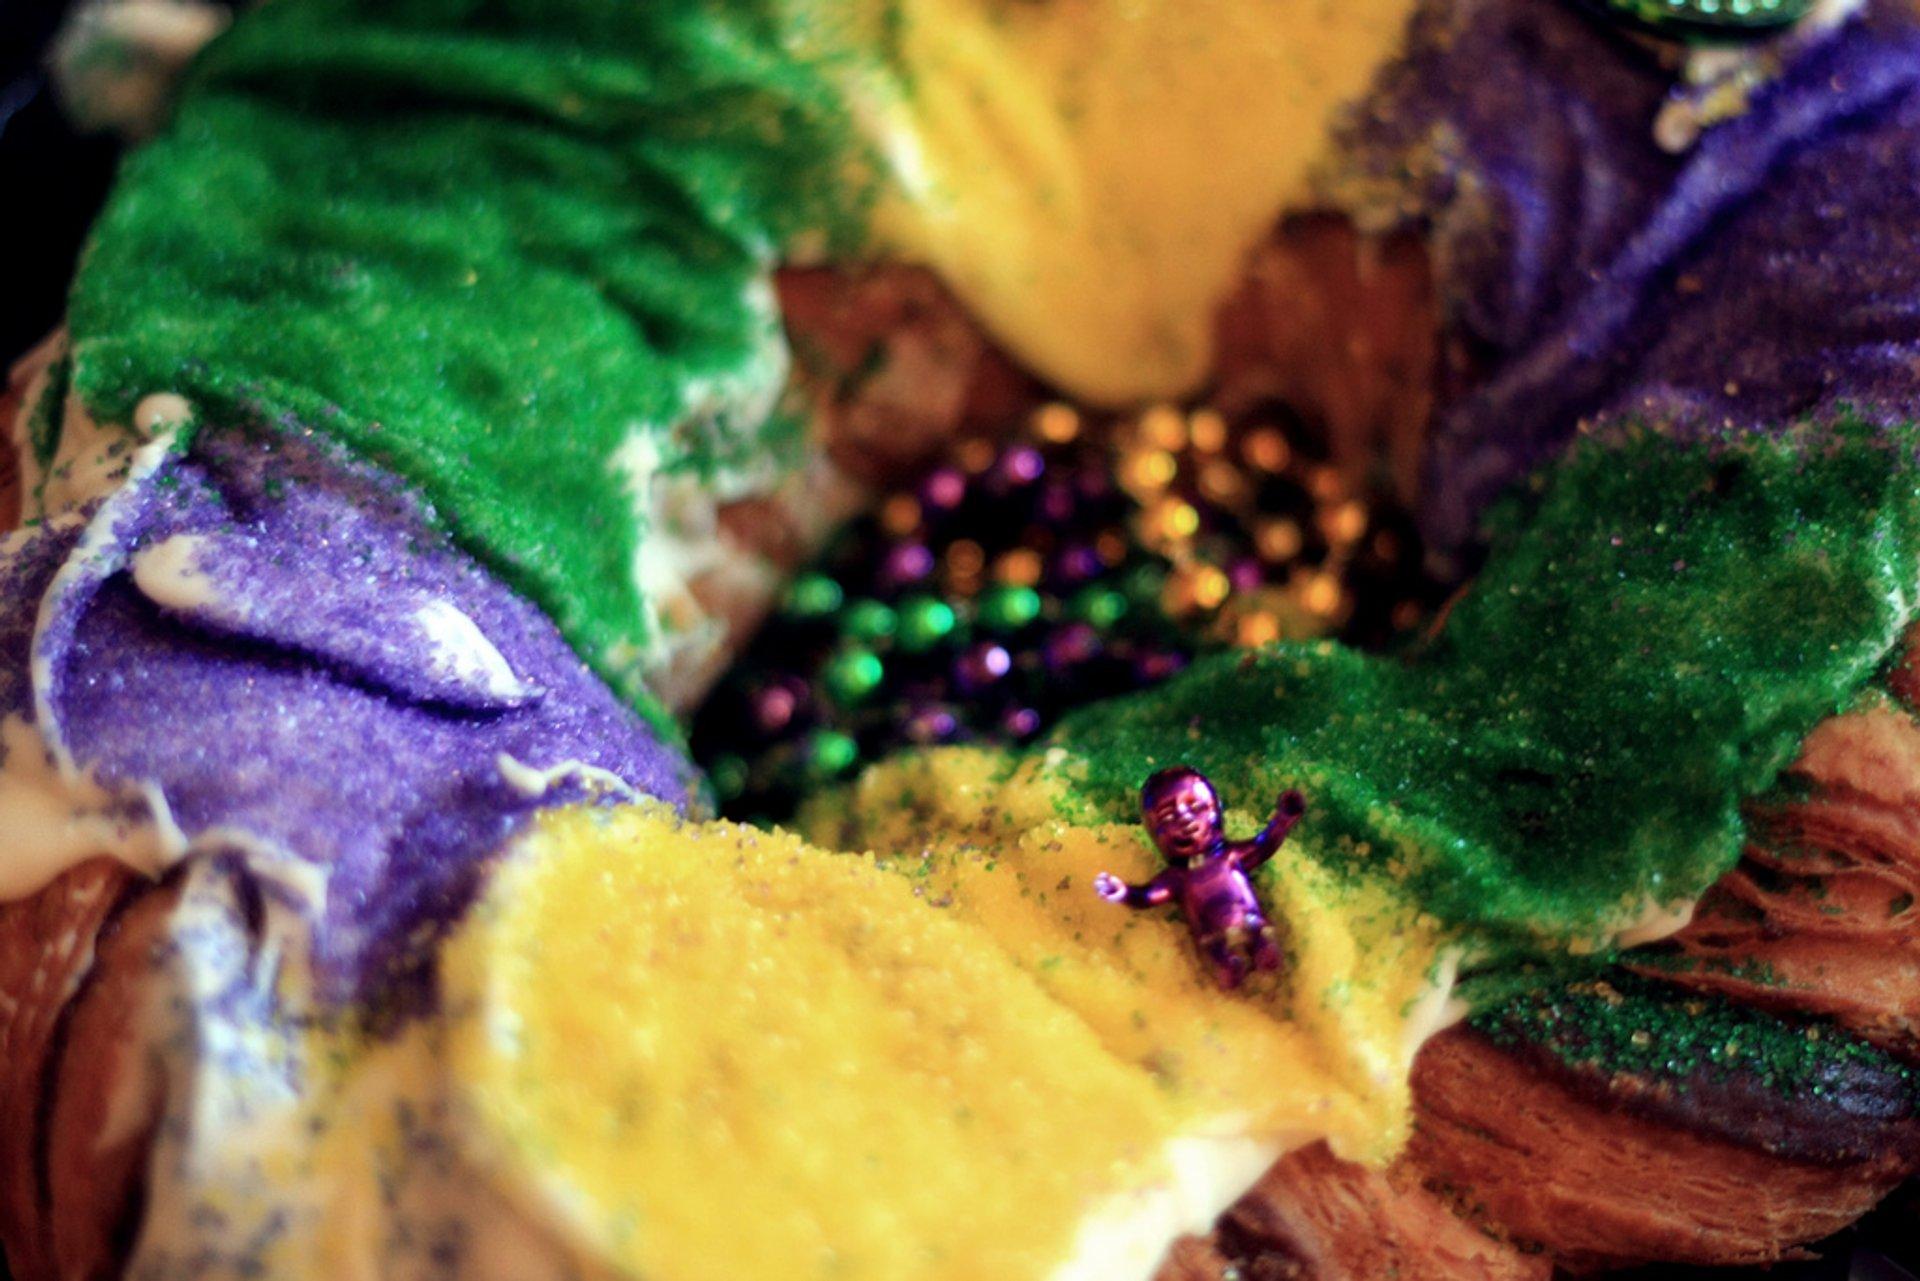 Mardi Gras King Cake in New Orleans - Best Season 2020